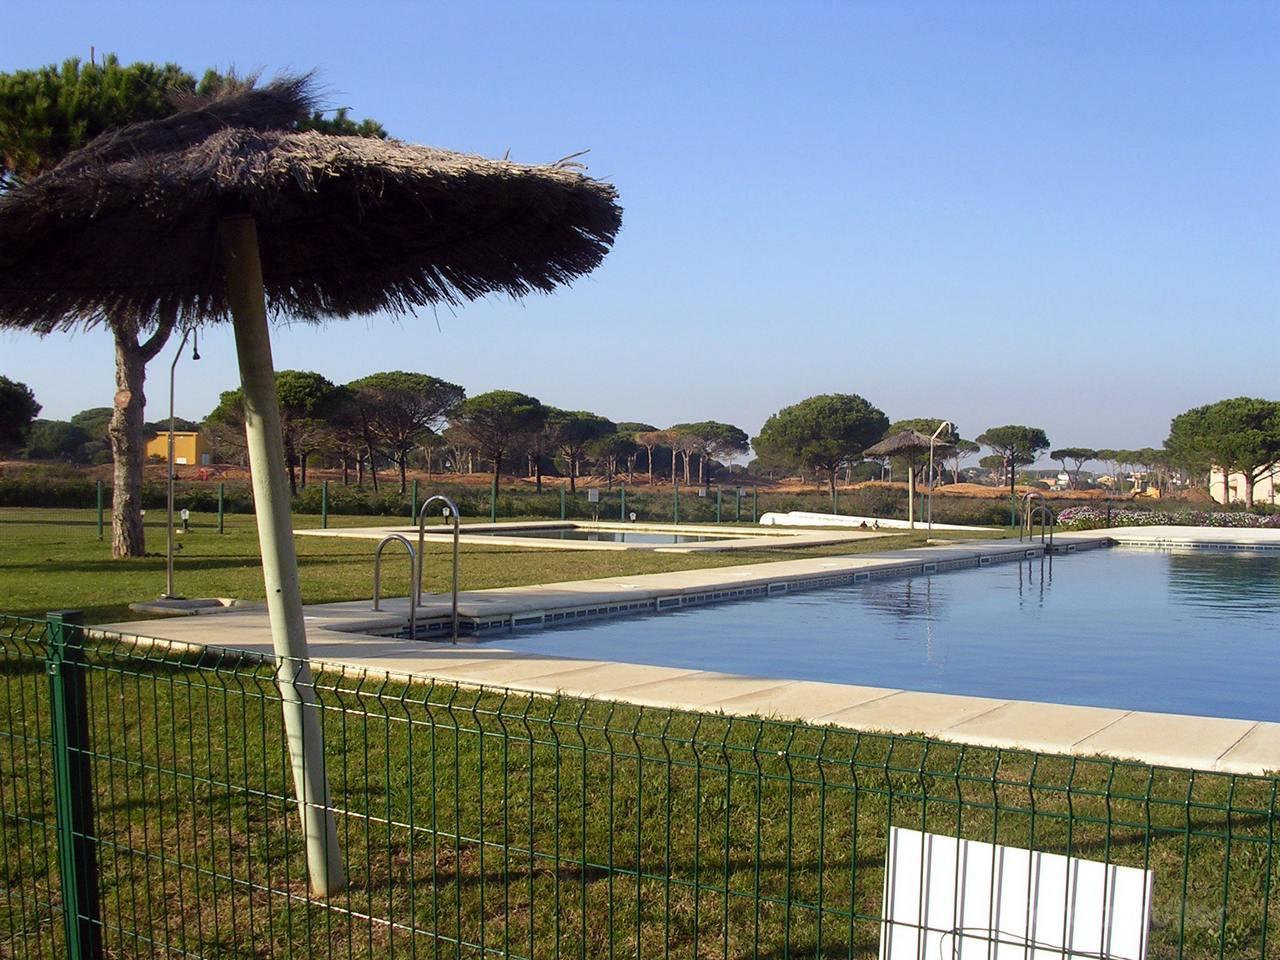 Apartamento en Chiclana de la Frontera, La Loma del Novo de Sancti Petri, Cádiz, ref.: a86